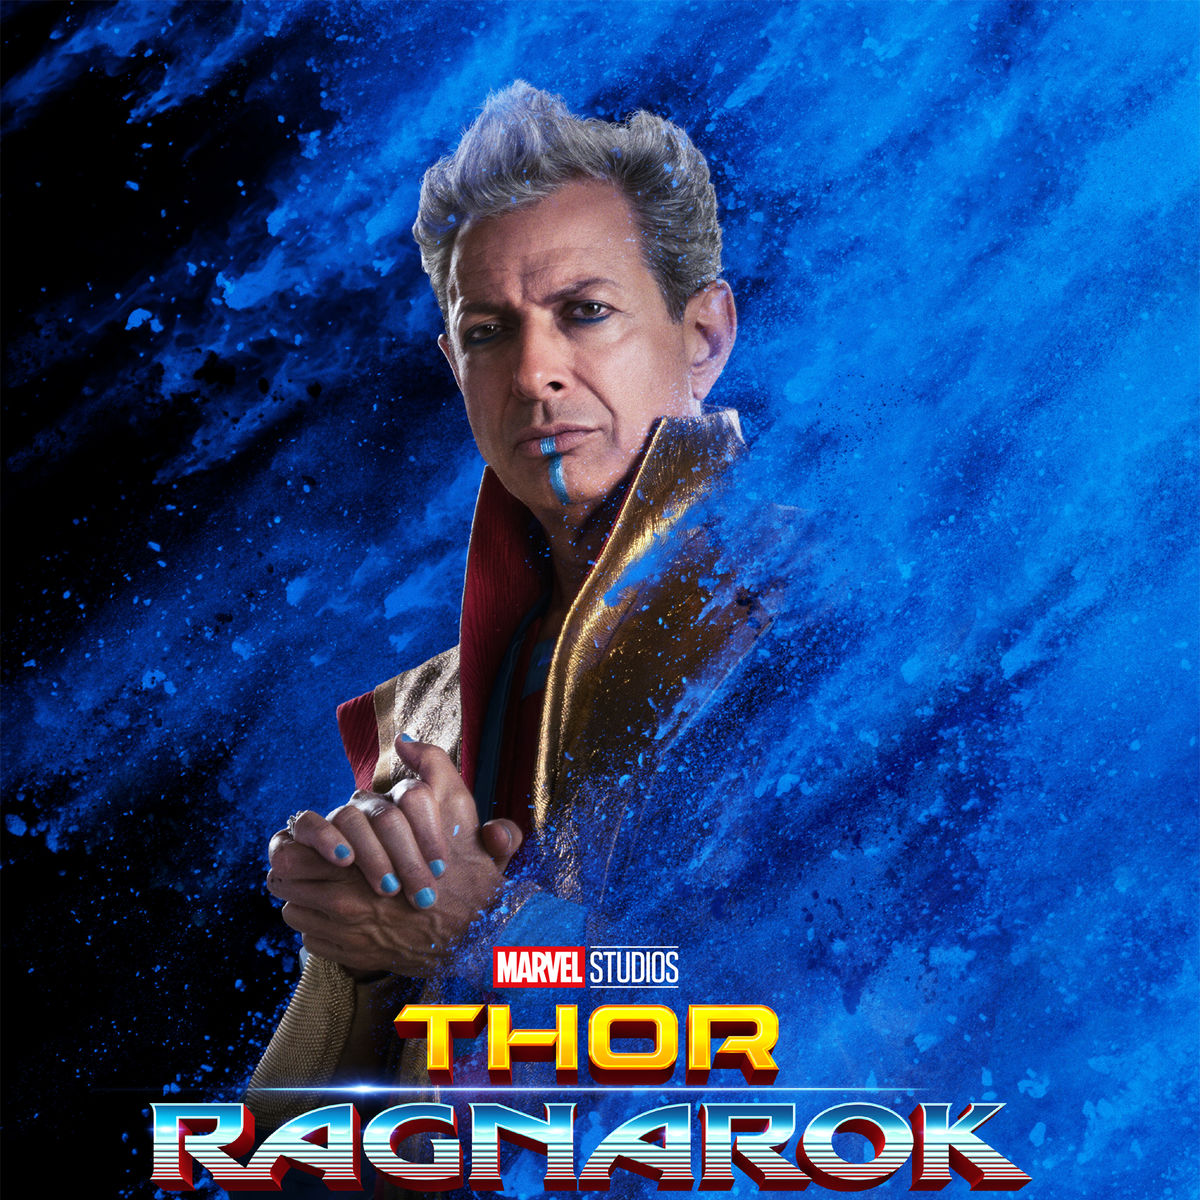 thor-ragnarok-grandmaster-poster.jpg